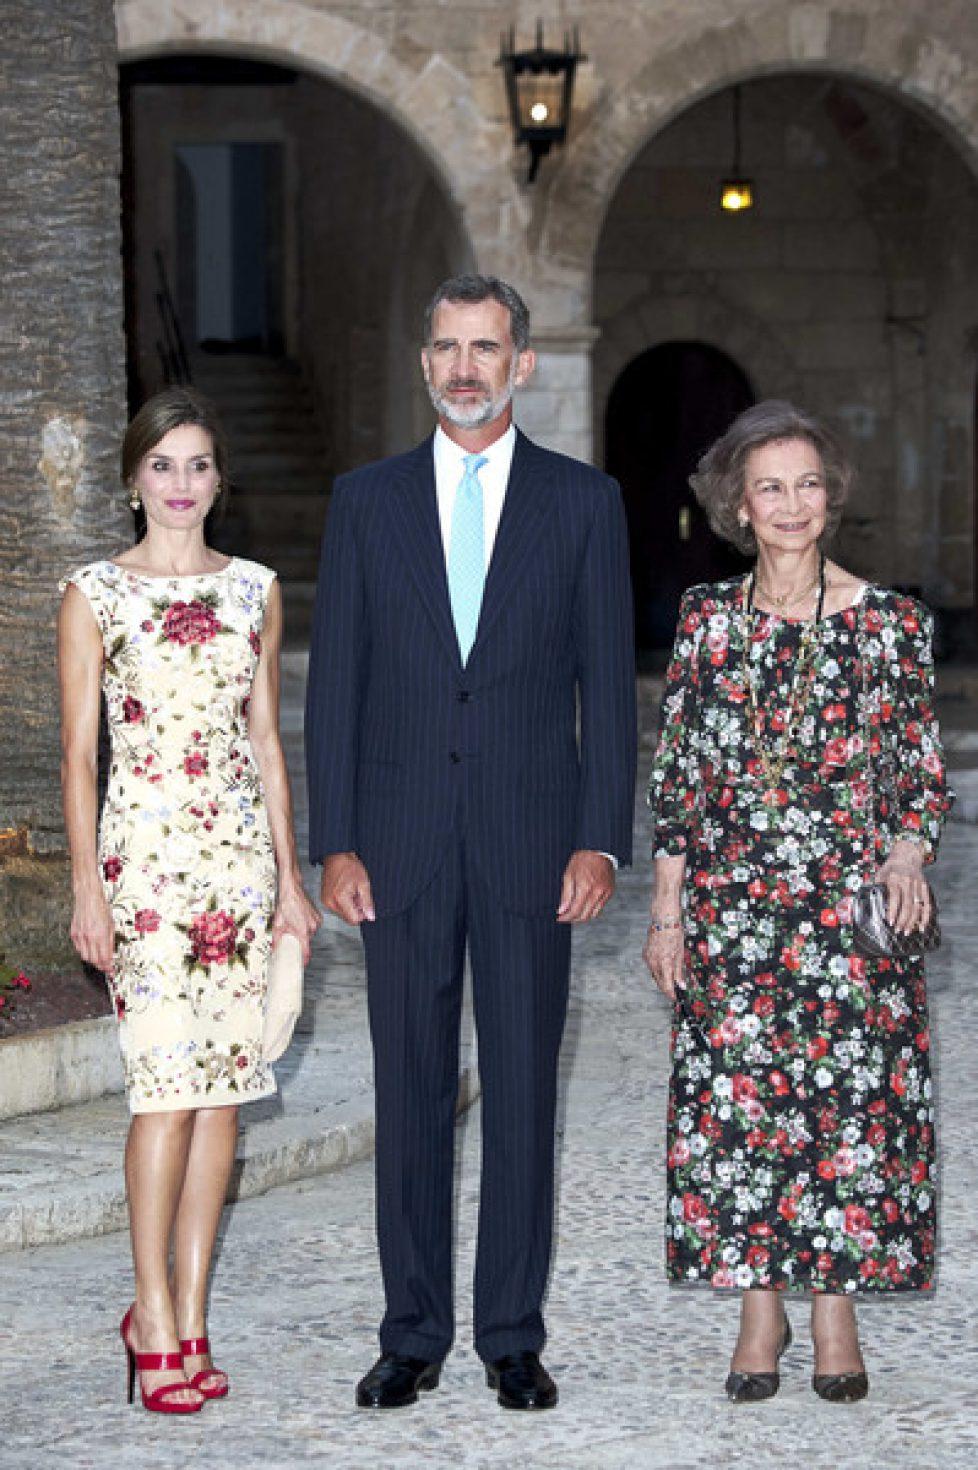 Spanish+Royals+Host+Dinner+Authorities+Palma+1N9uAQ5K49ll